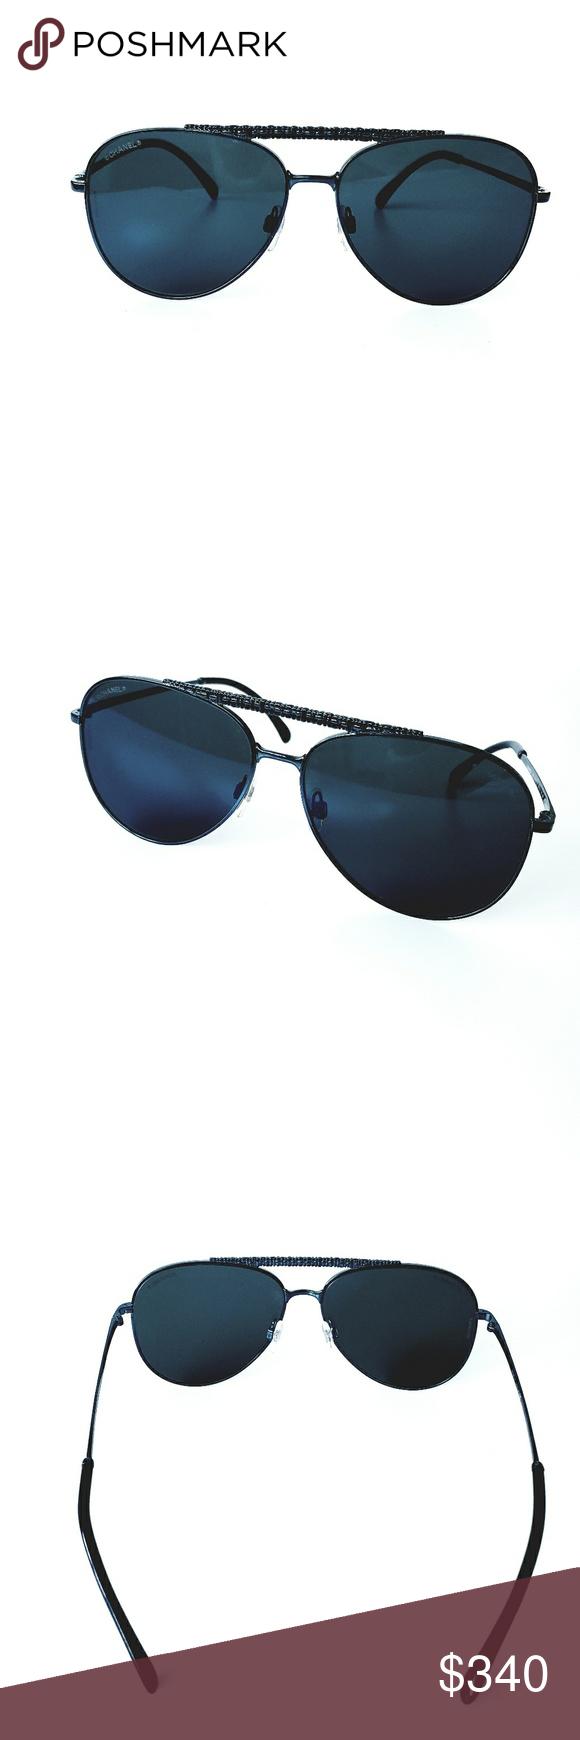 d71e022c4e Chanel 4231 Blue Aviator Pilot Men's Sunglasses Authentic Chanel ...